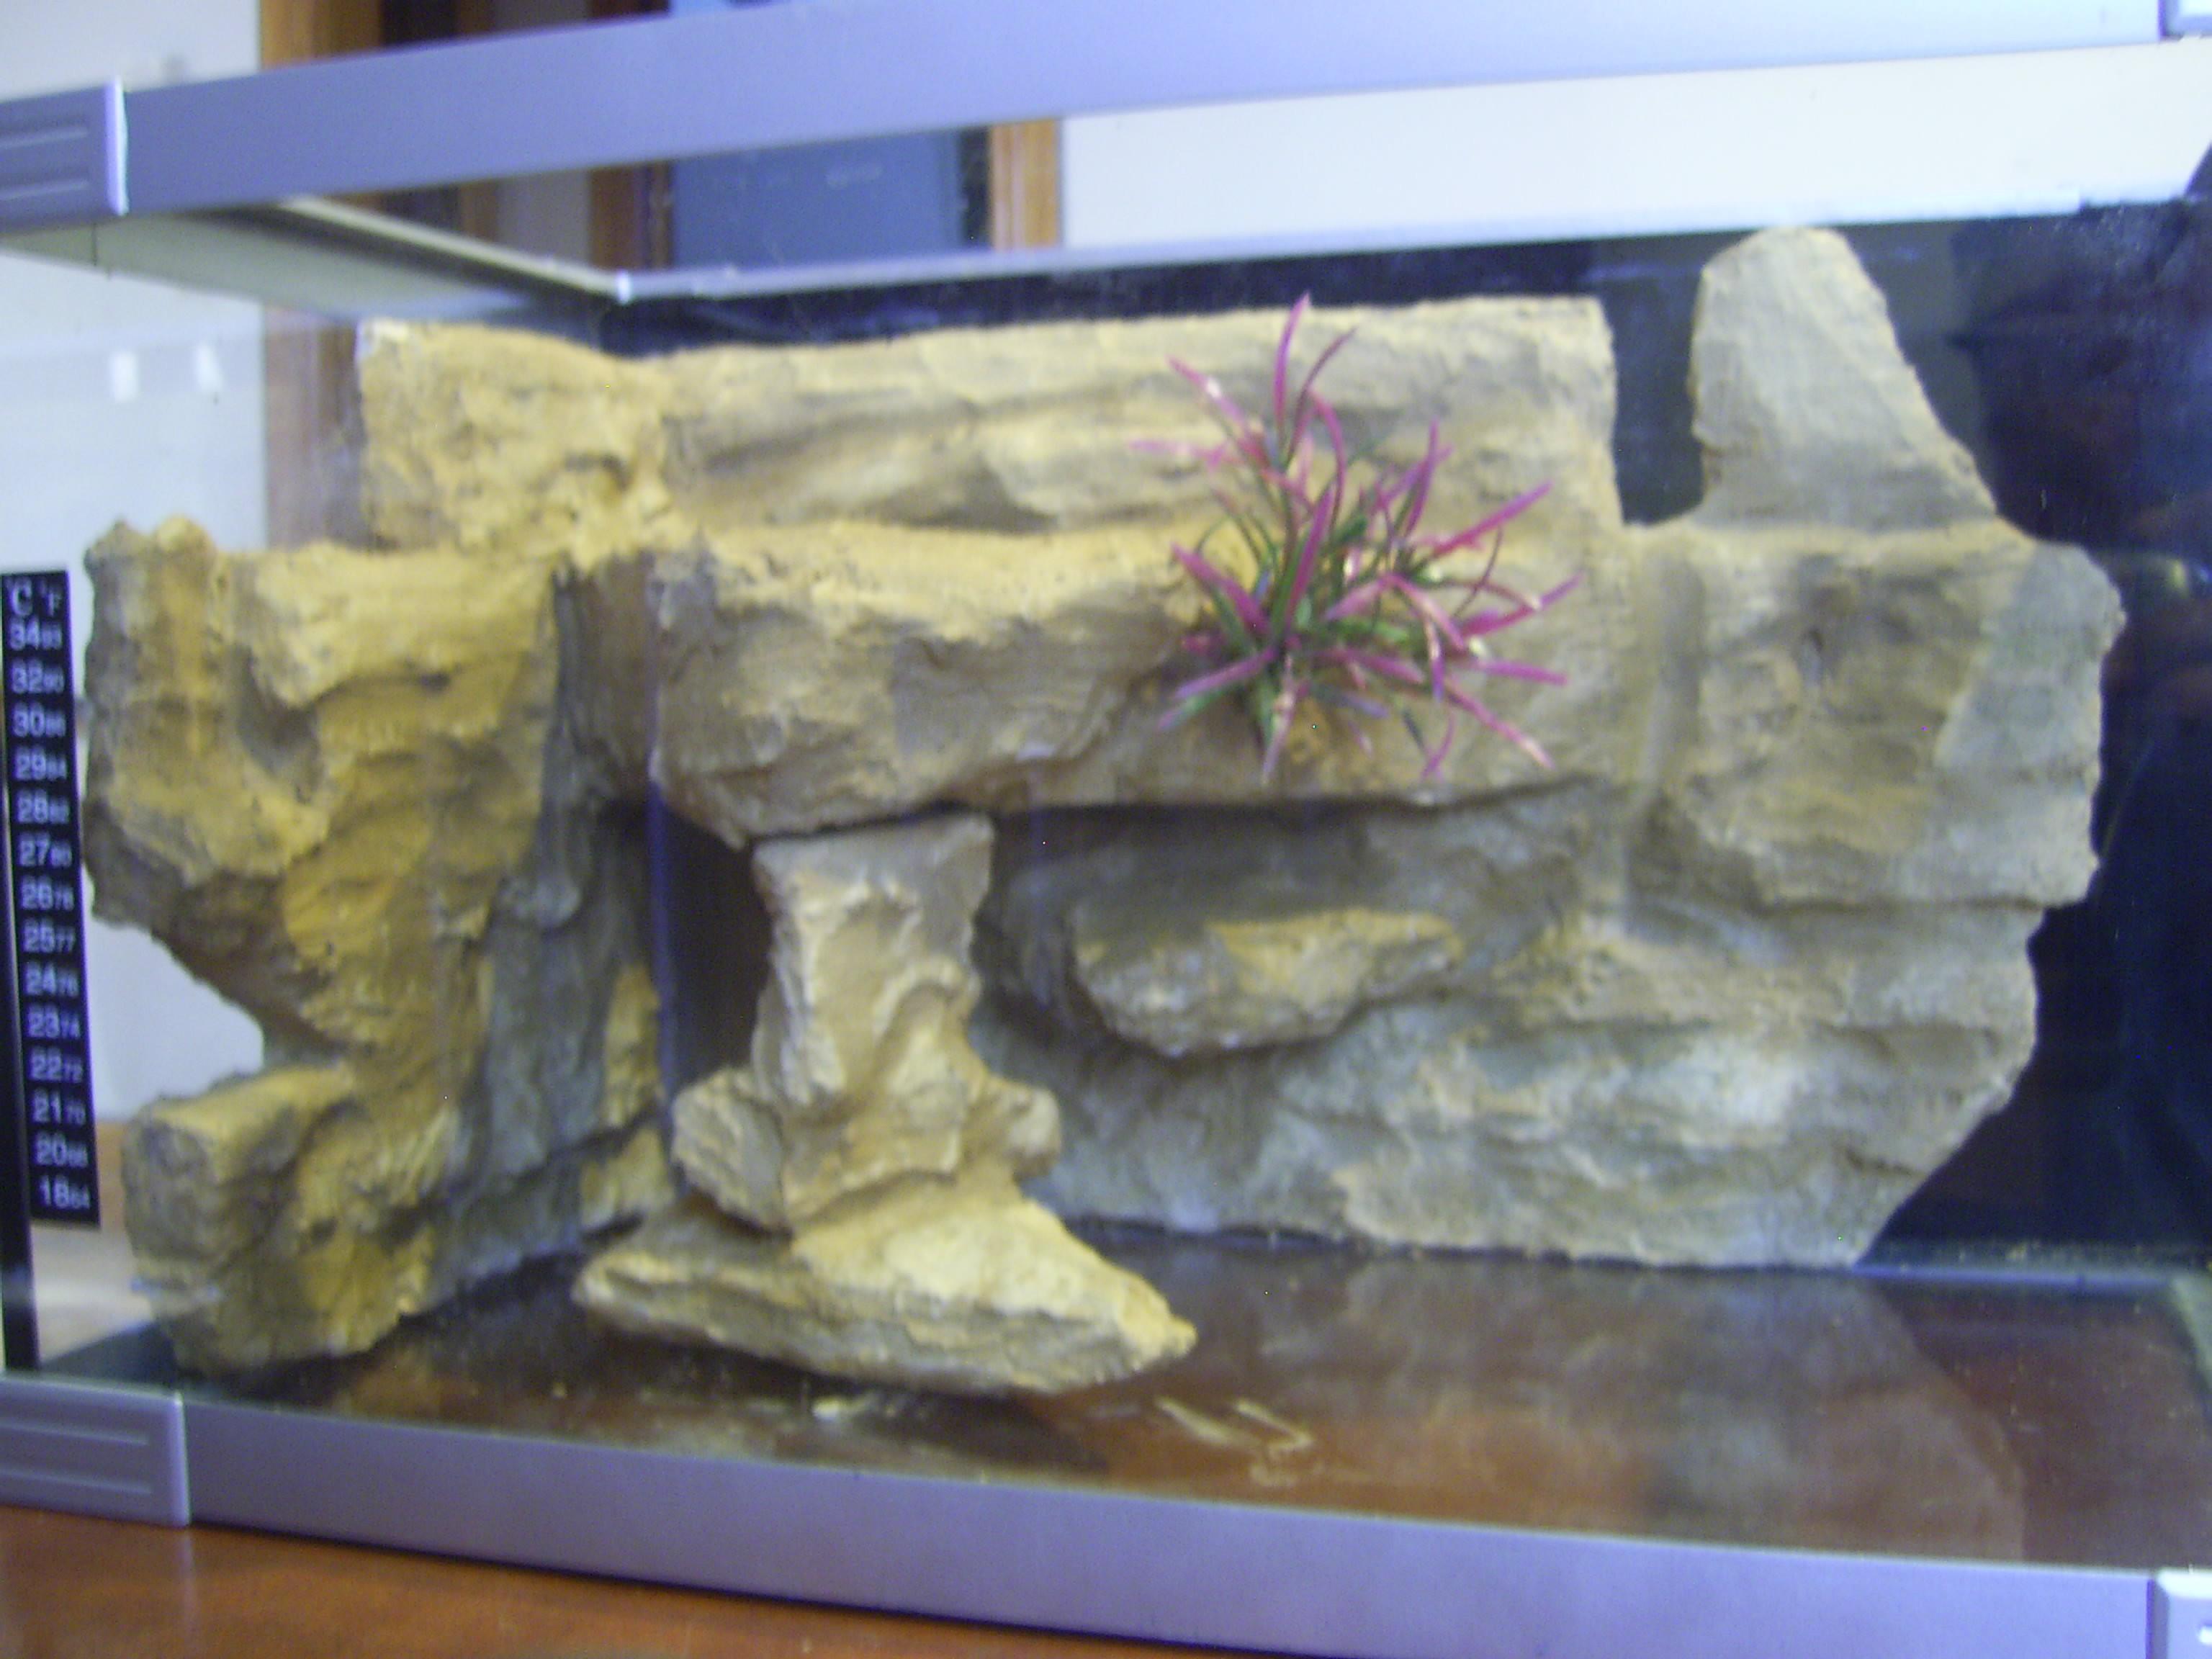 Best ideas about DIY Aquarium Background . Save or Pin cichlids DIY aquarium background Now.